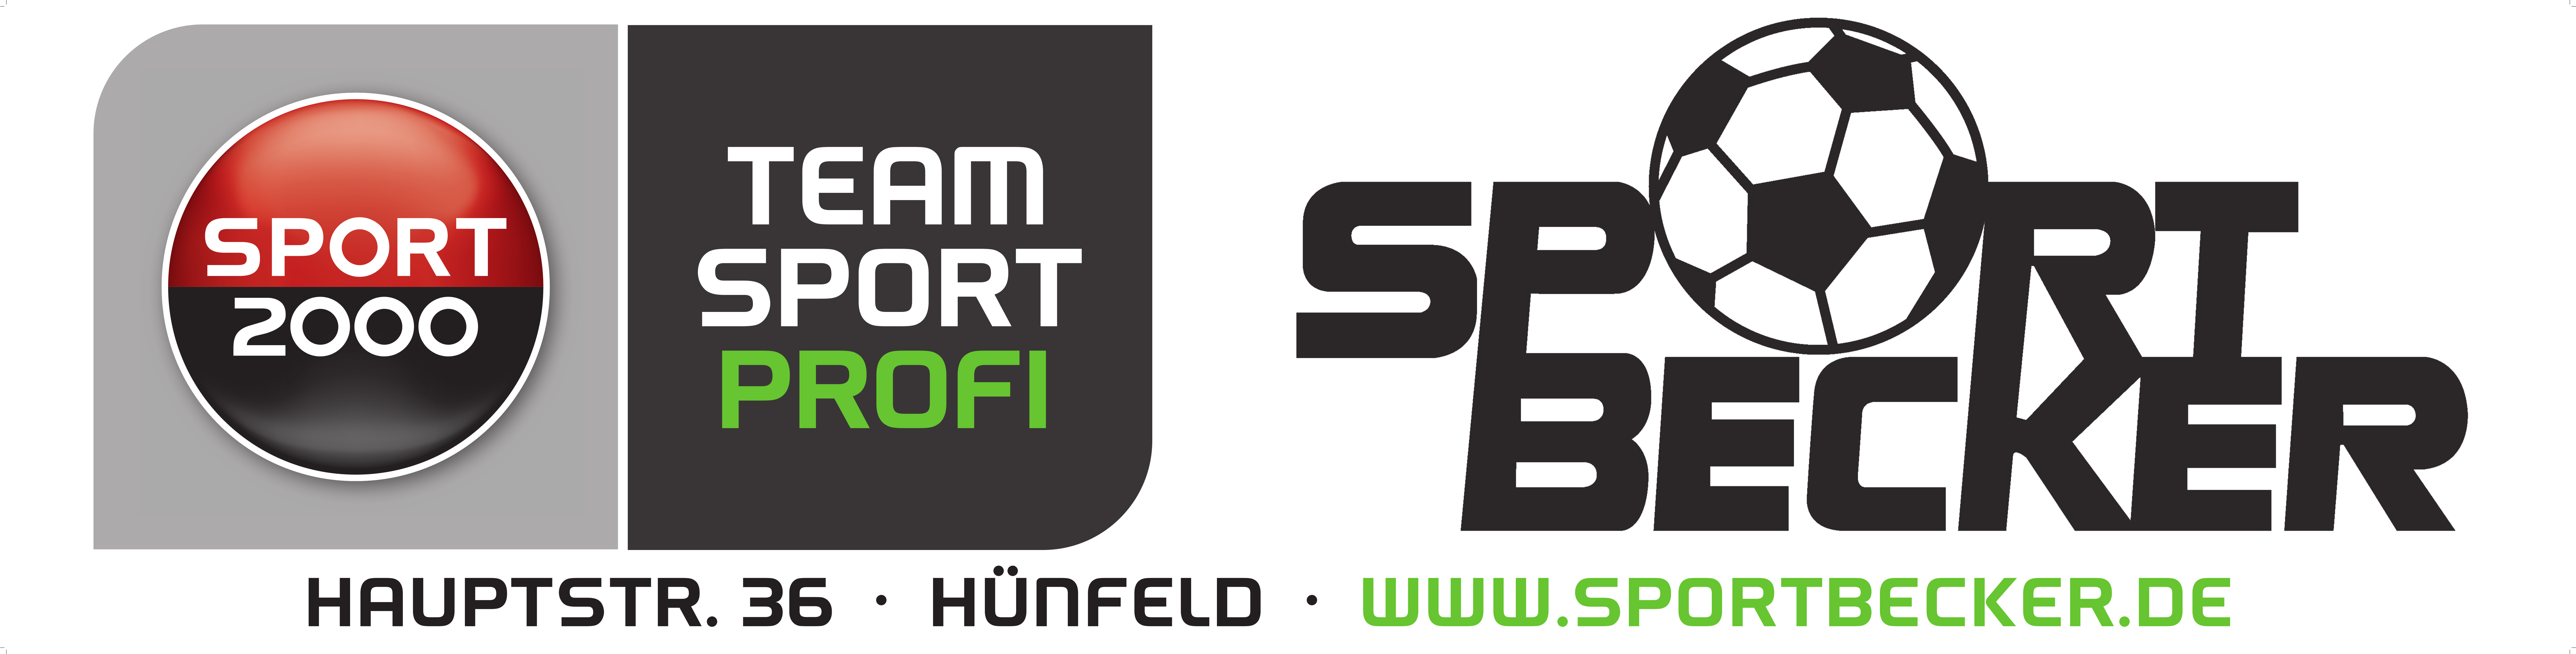 bande-becker-huenfeld_3500x750